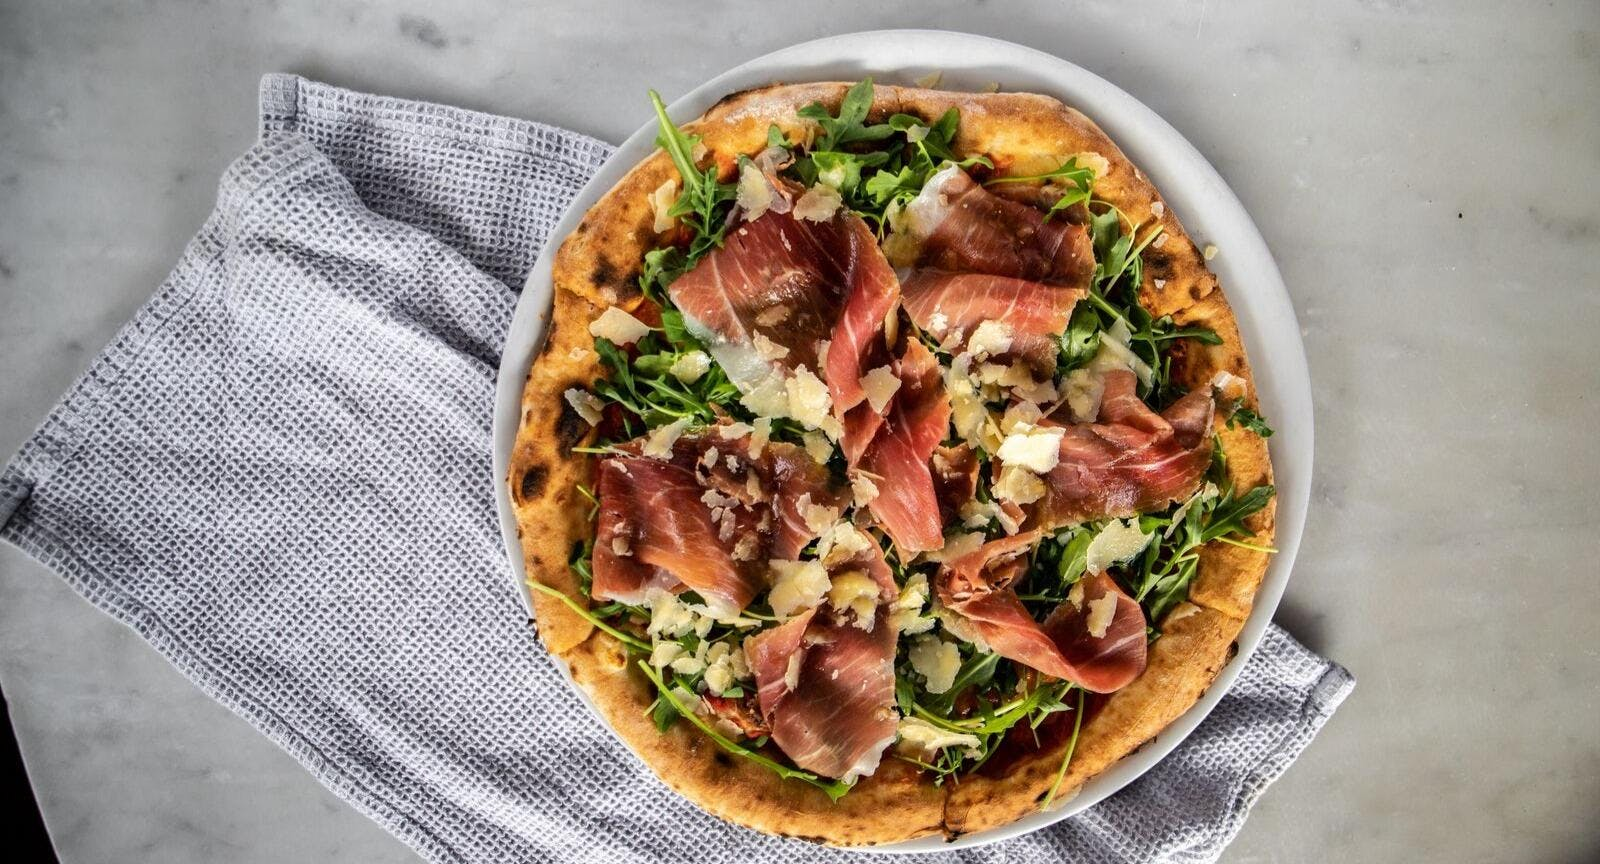 Pizza Birra Sydney image 2